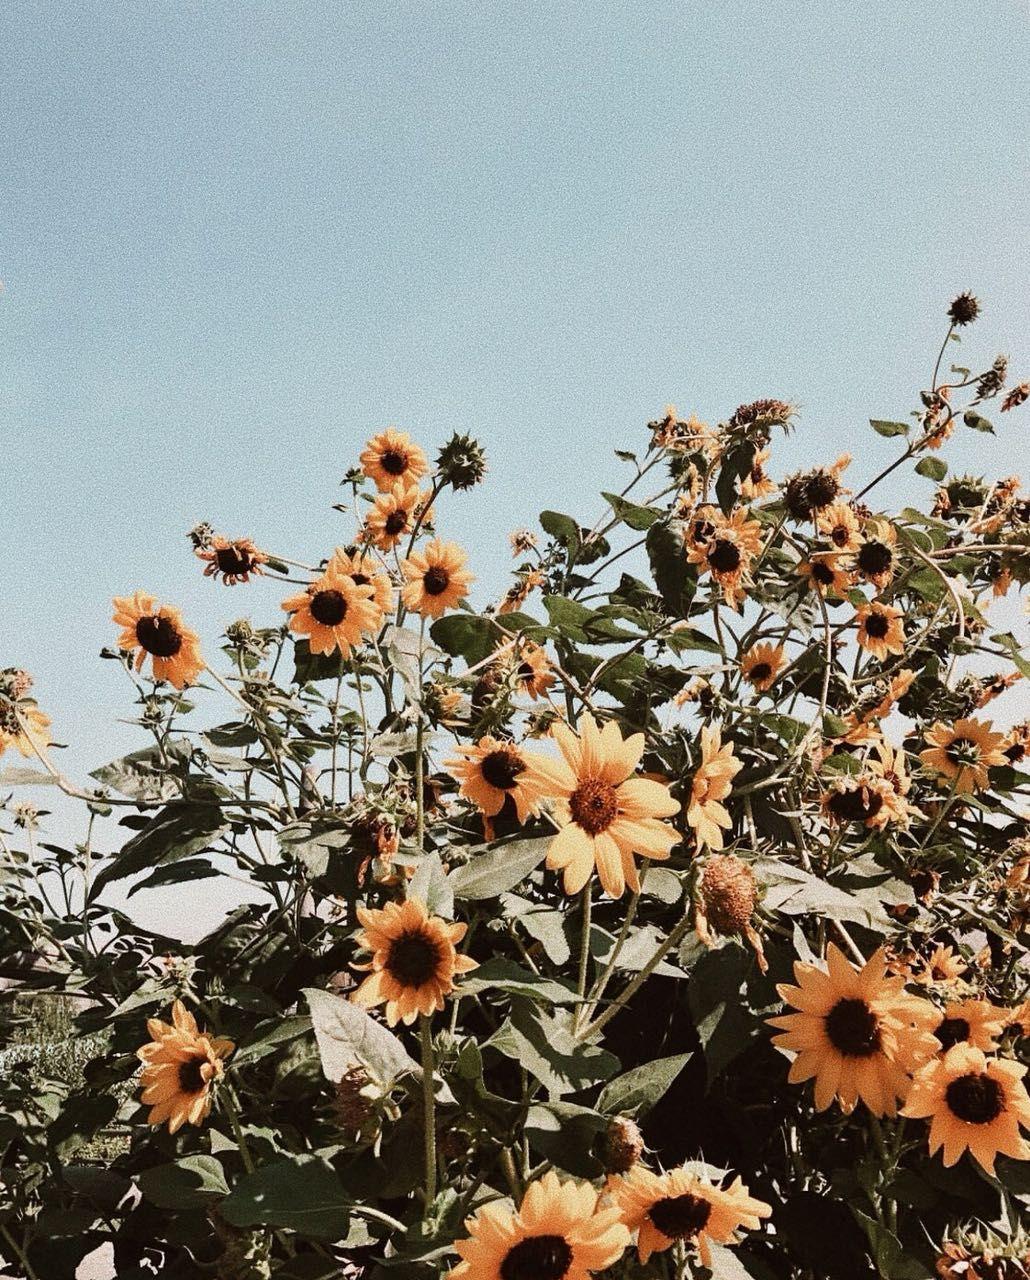 Www Boho Travels Com Pinterest Bohotravelsblog Instagram